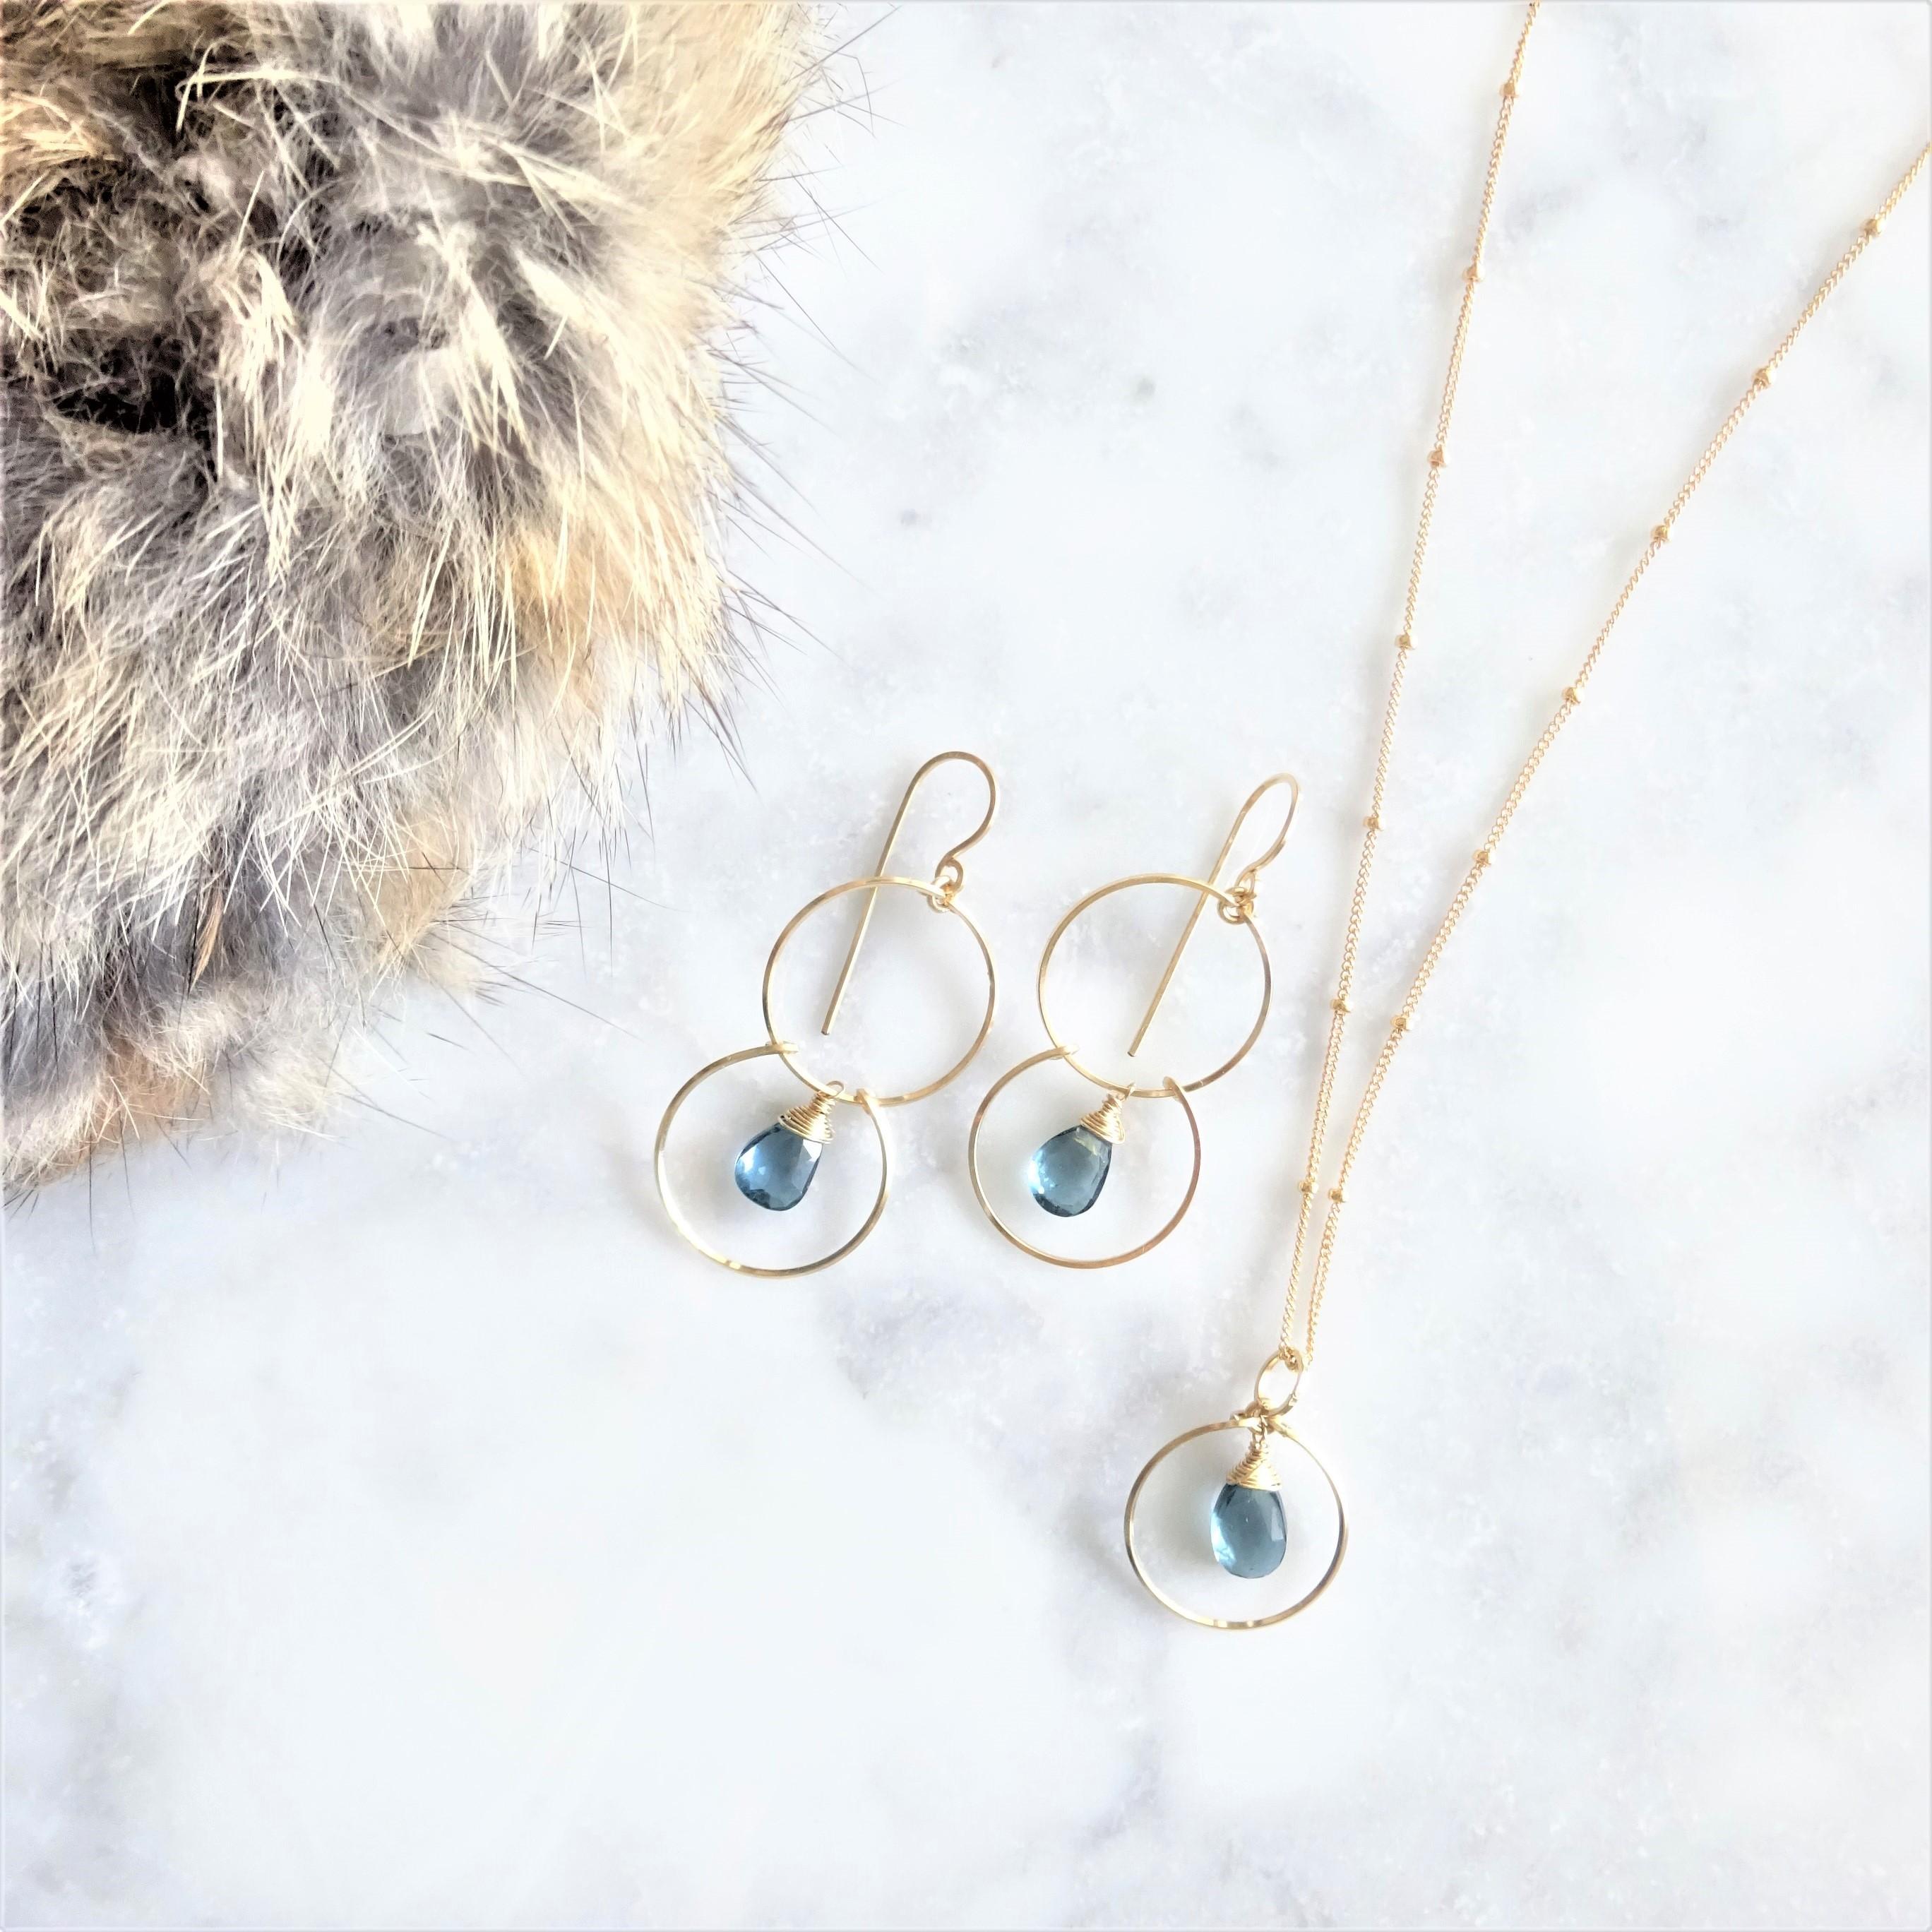 送料無料14kgf*宝石質London Blue Topaz ring necklace